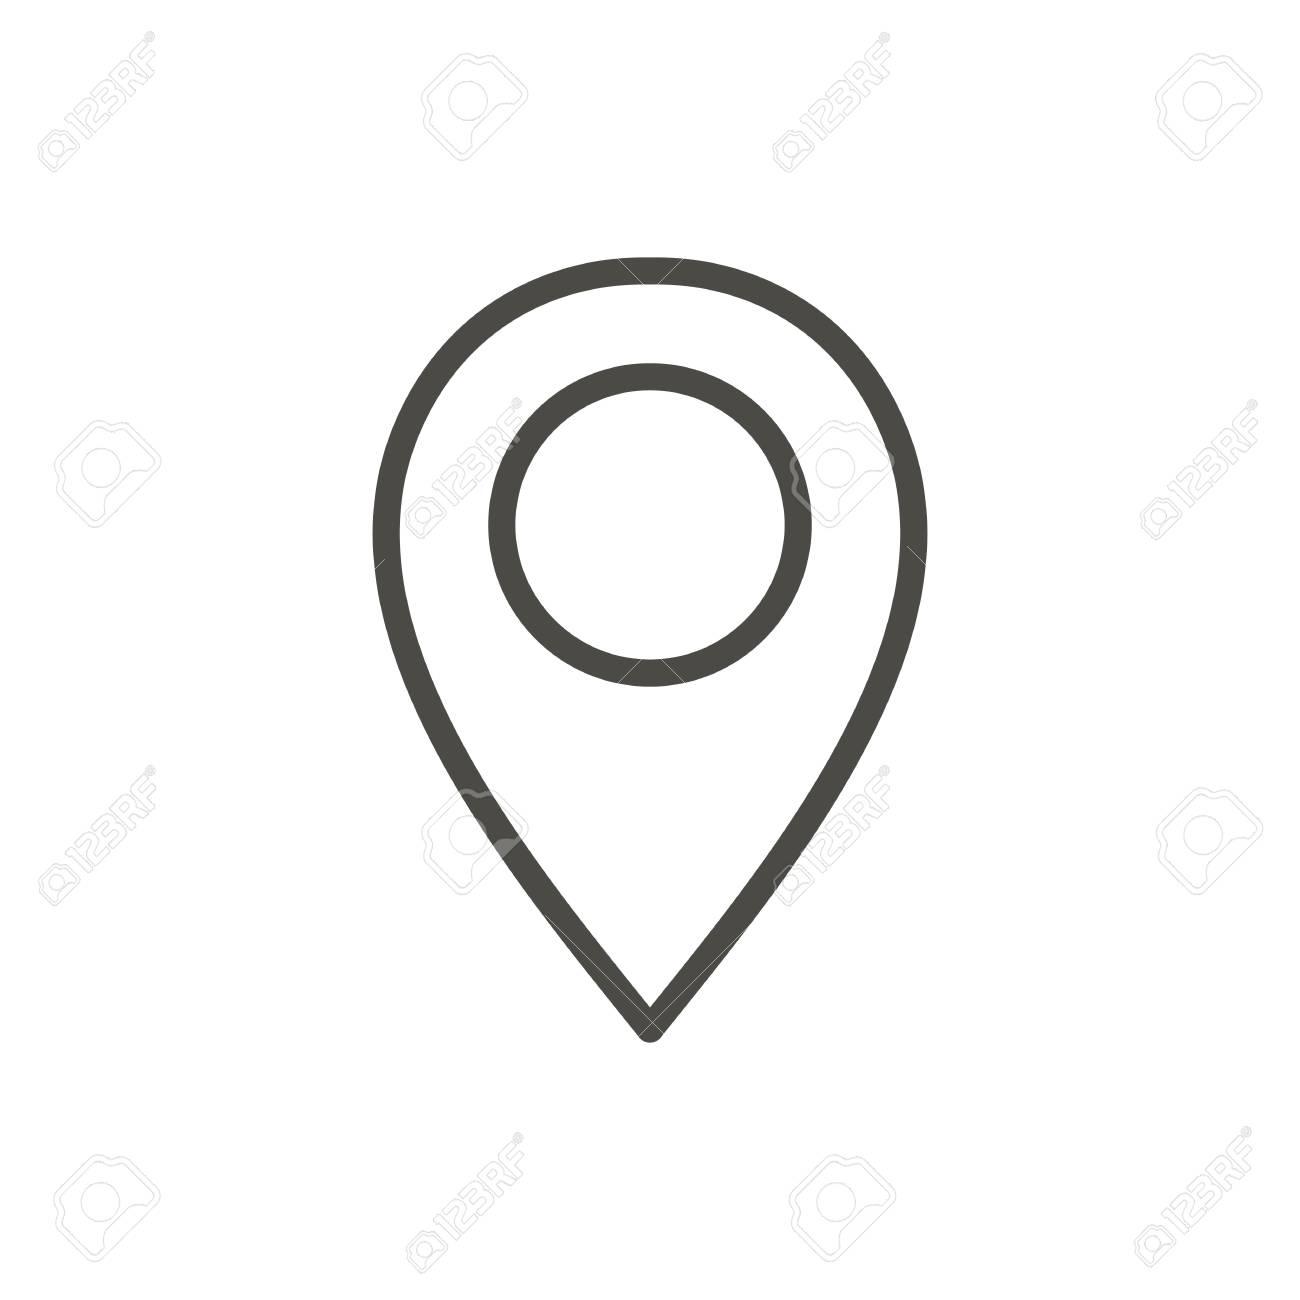 Pin map icon vector. Line location symbol. - 98713690